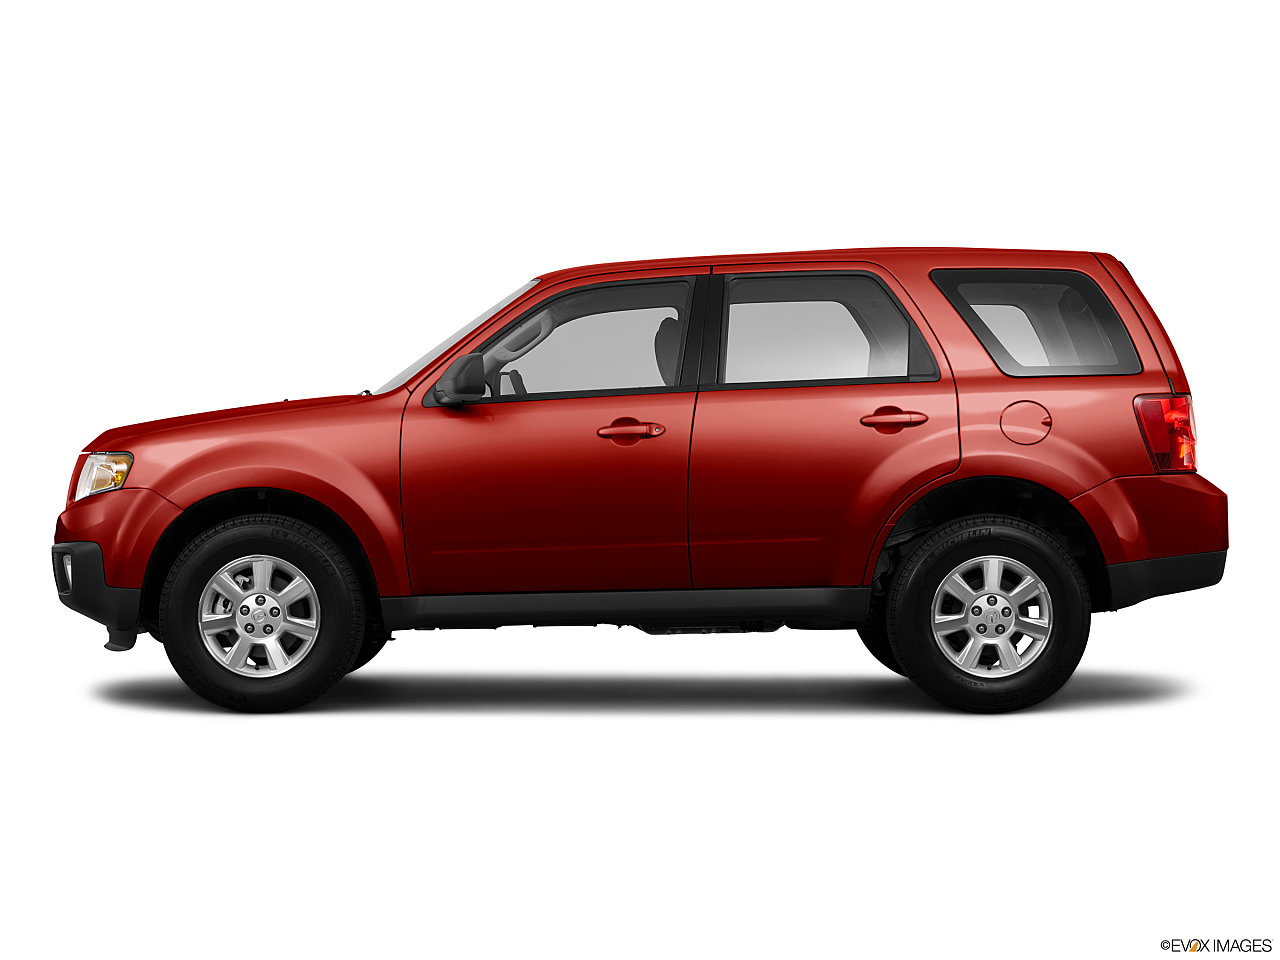 2011 Mazda Tribute at Town Square Motors of Lawrenceville, GA. The dealership has not